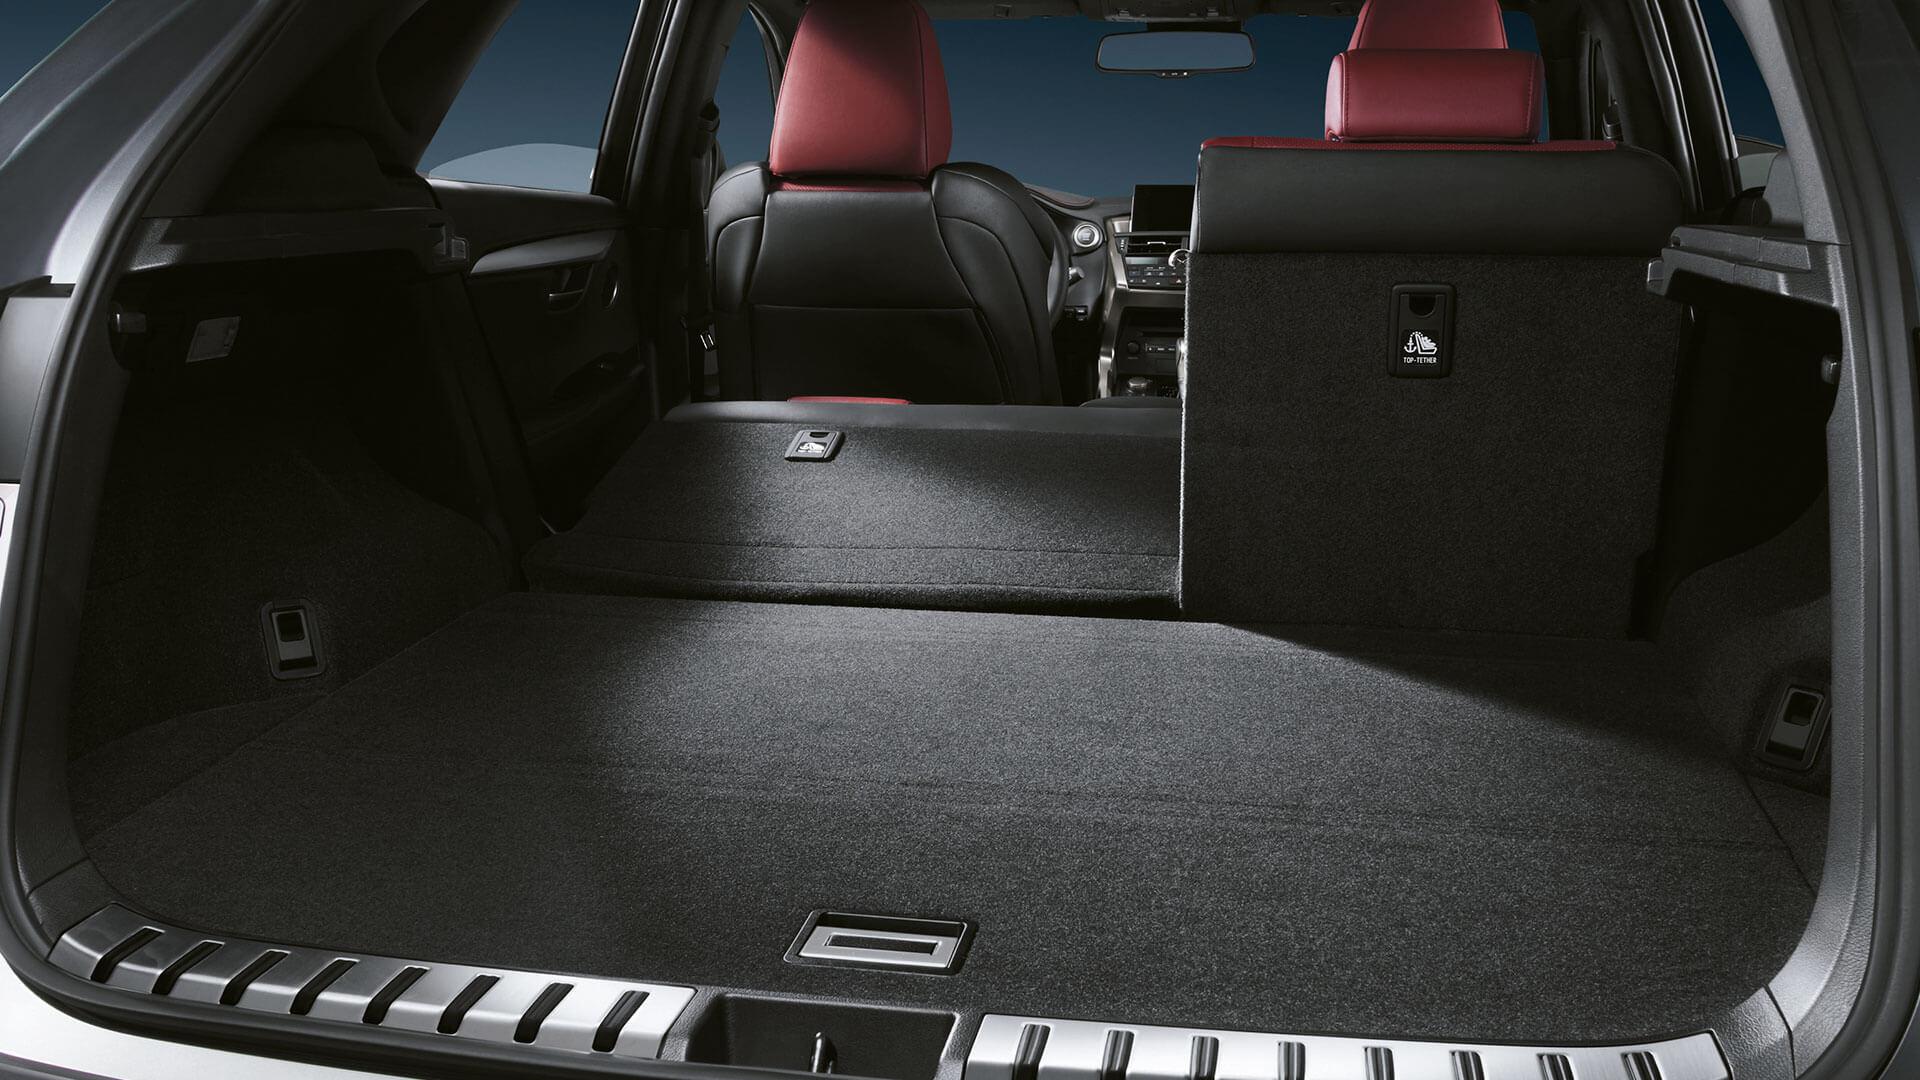 2017 lexus nx 300h features flexible luggage